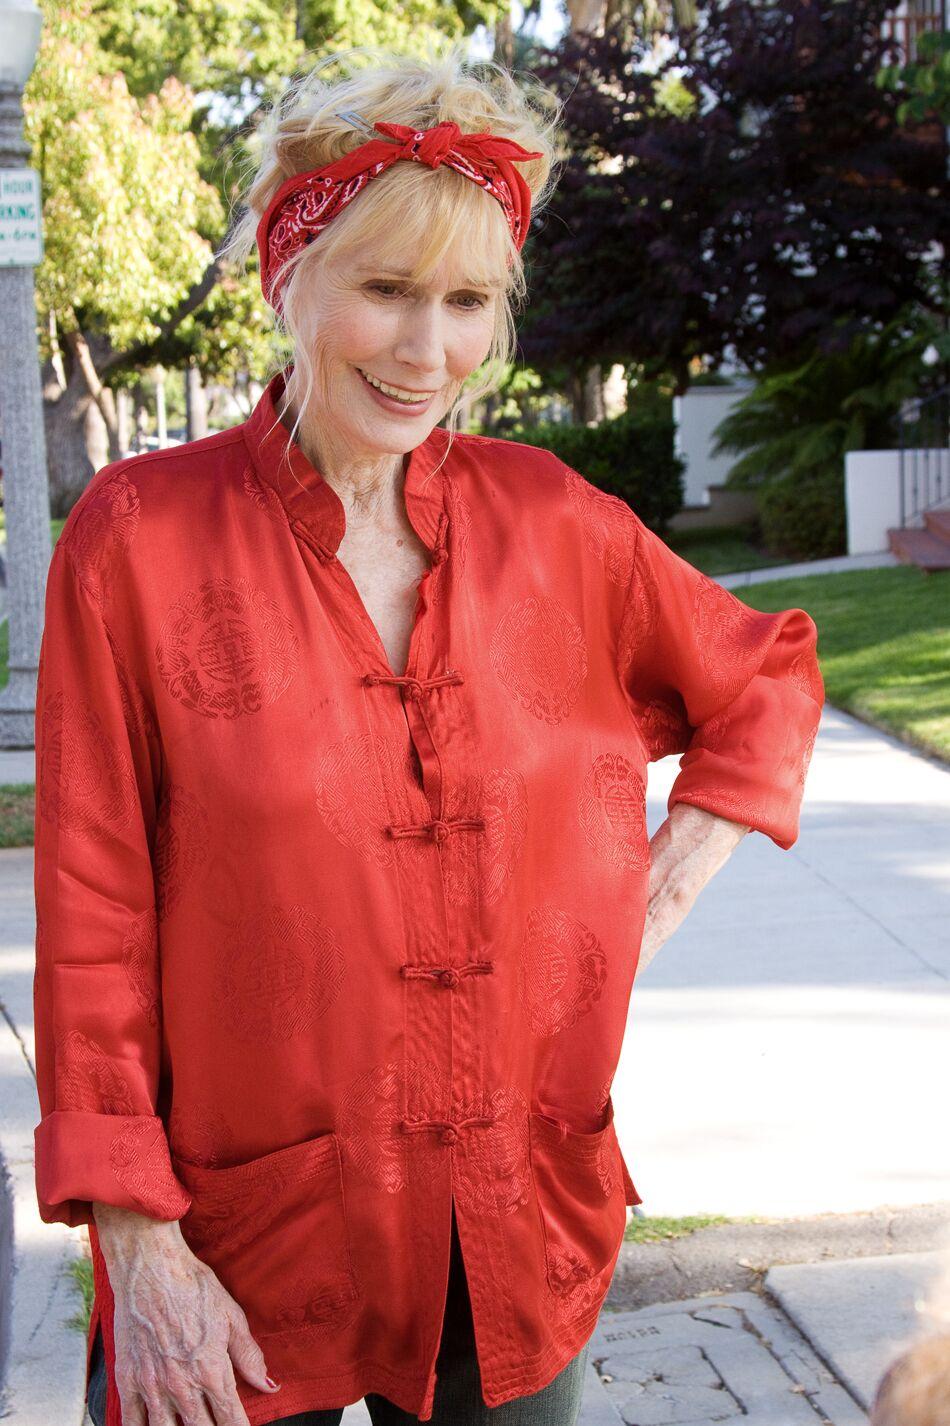 Thumbnail_Joans Day Out_Sally Kellerman.jpg